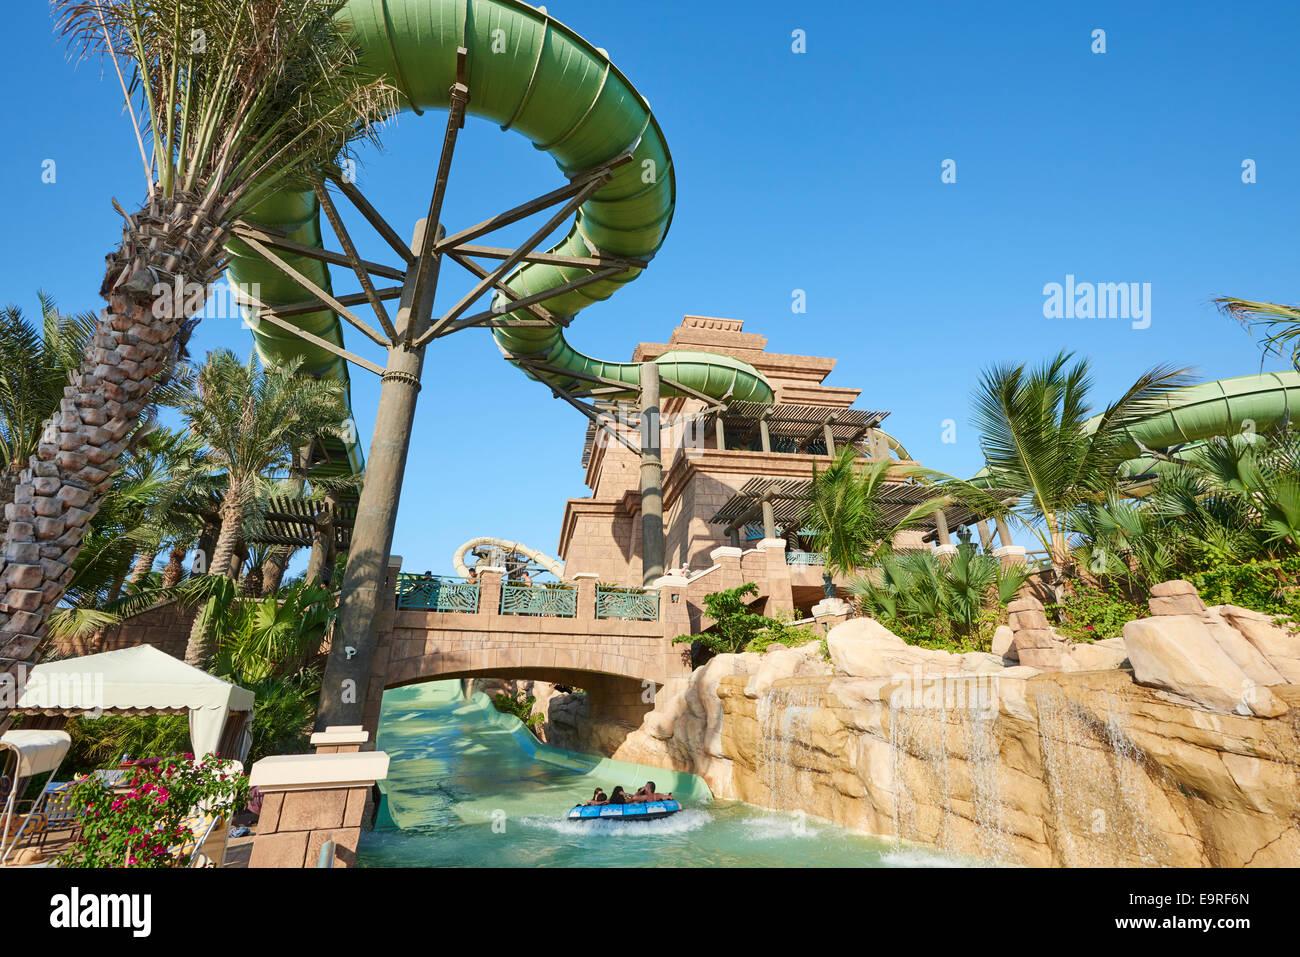 The Tower Of Poseidon Water Slide At Aquaventure Waterpark Atlantis Hotel Palm Dubai UAE